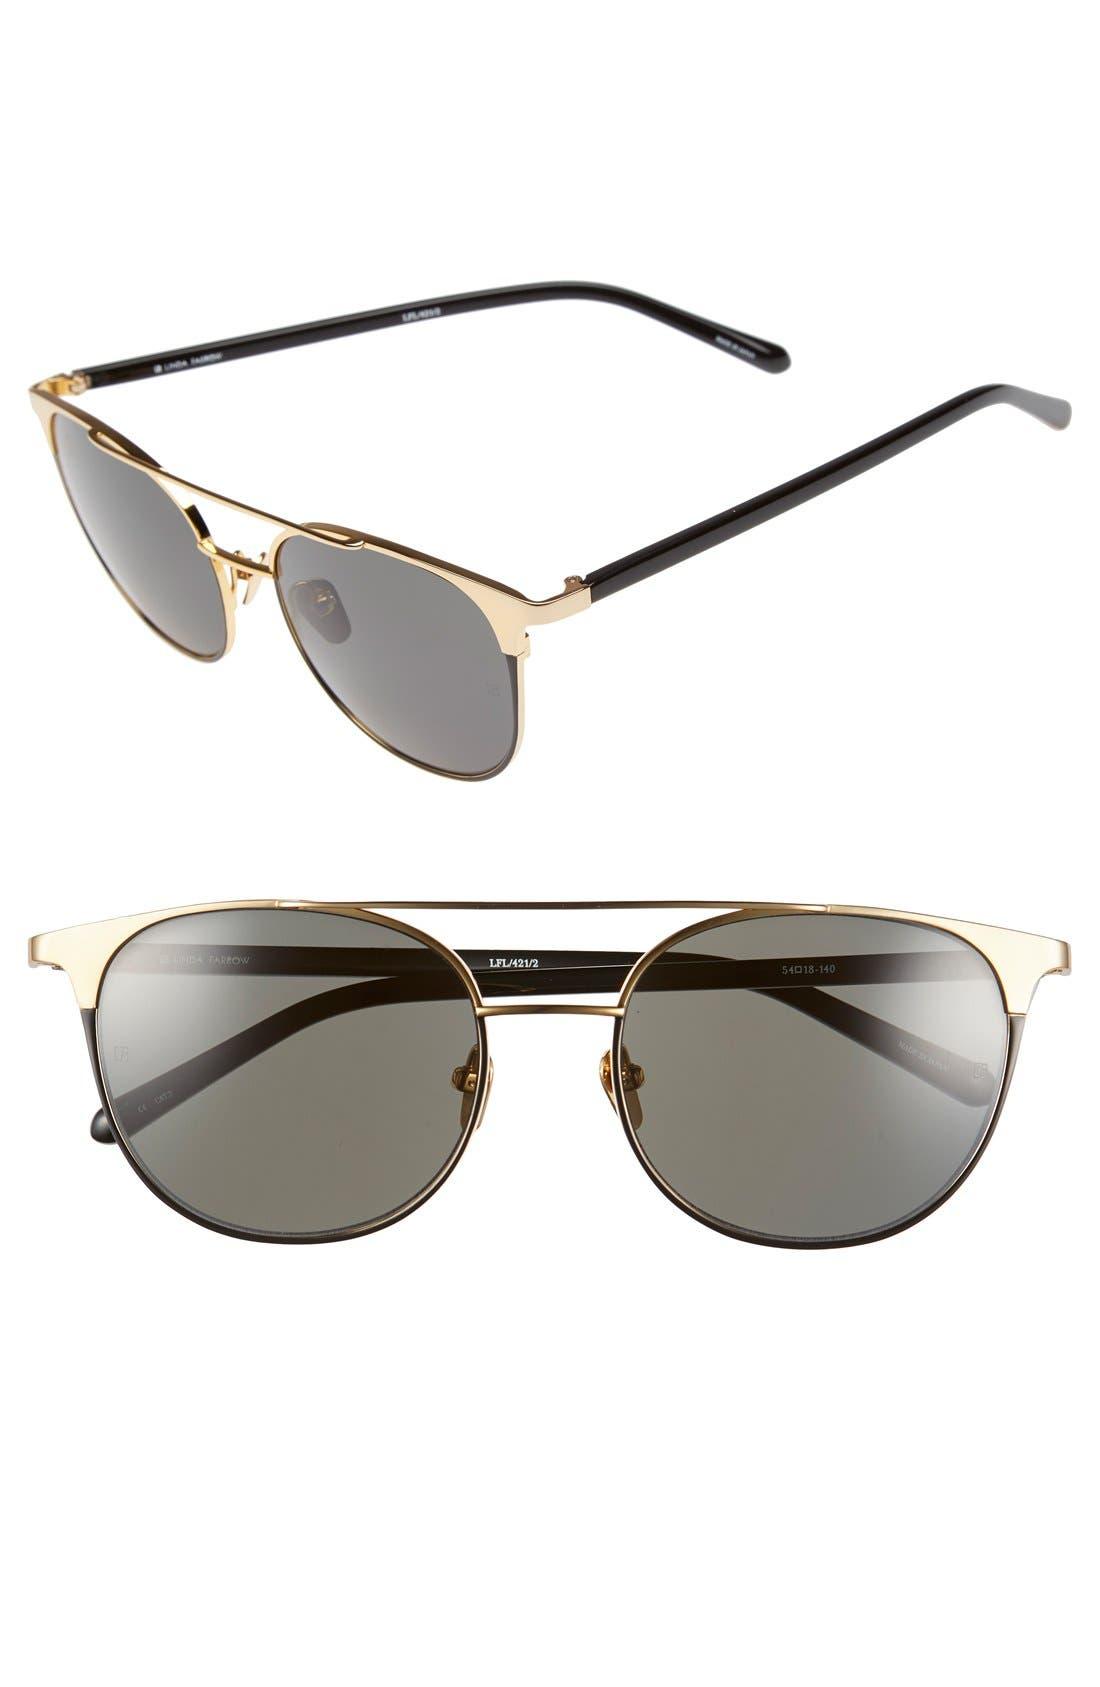 Linda Farrow 54mm 22 Karat Gold Trim Sunglasses